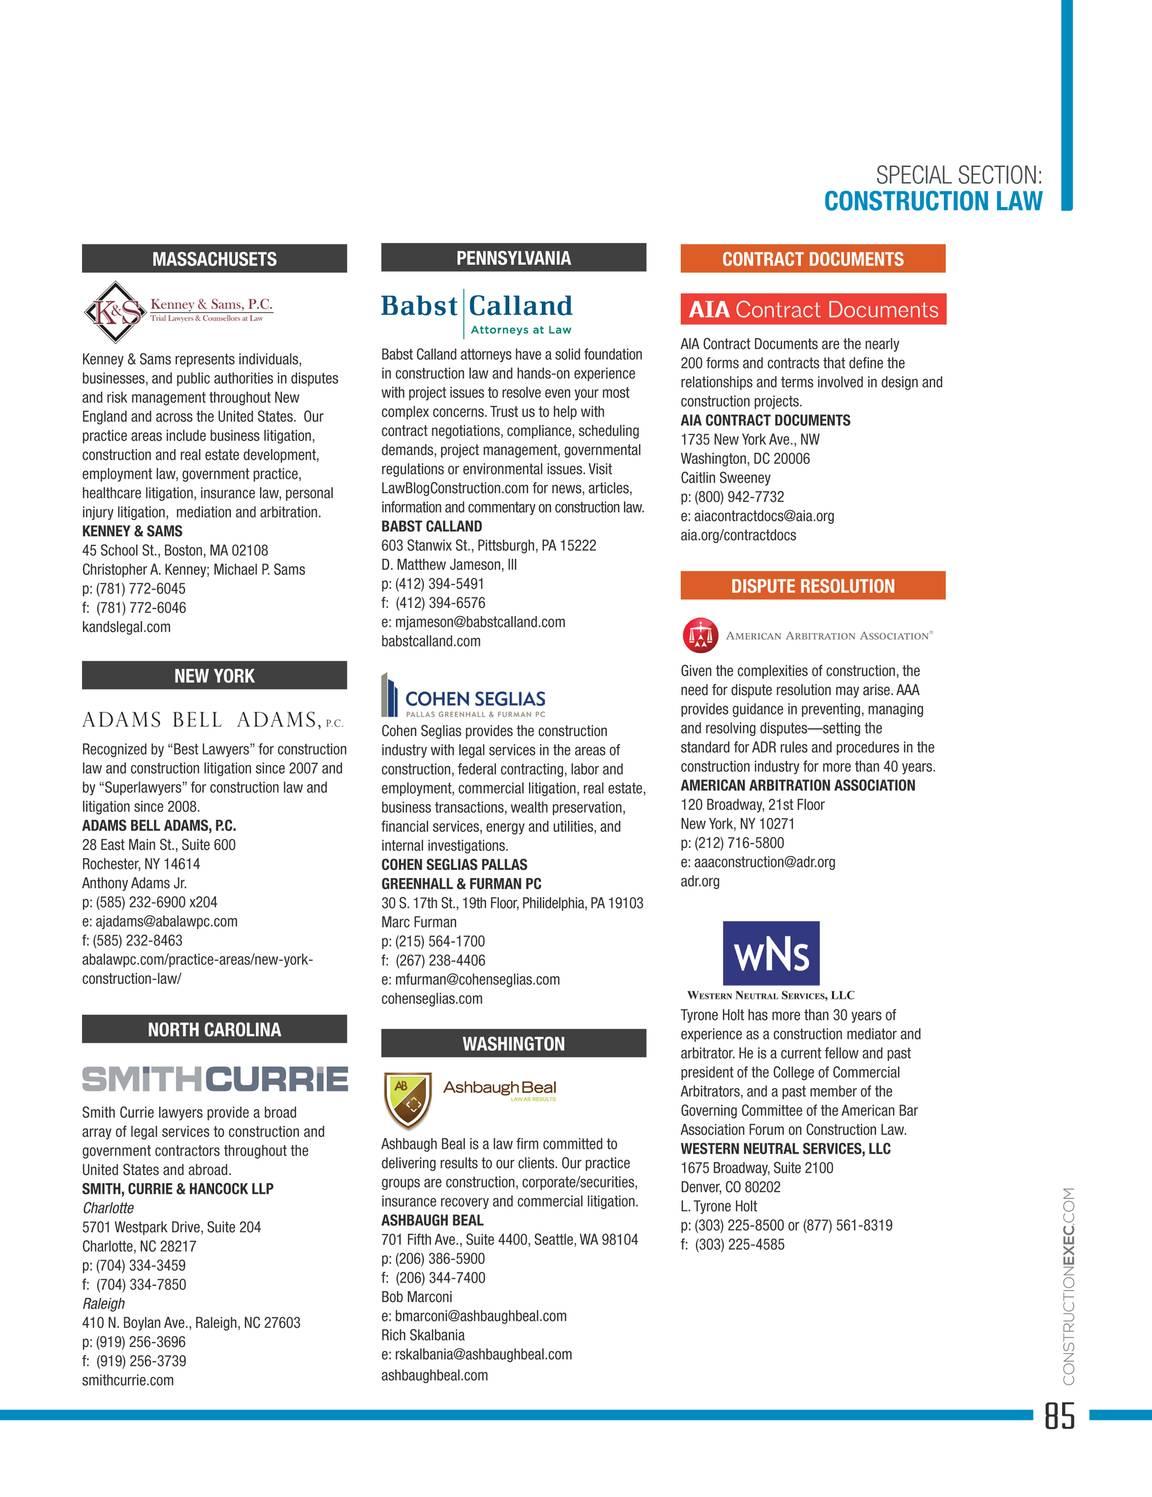 Construction Executive Magazine - June 2017 - page 84